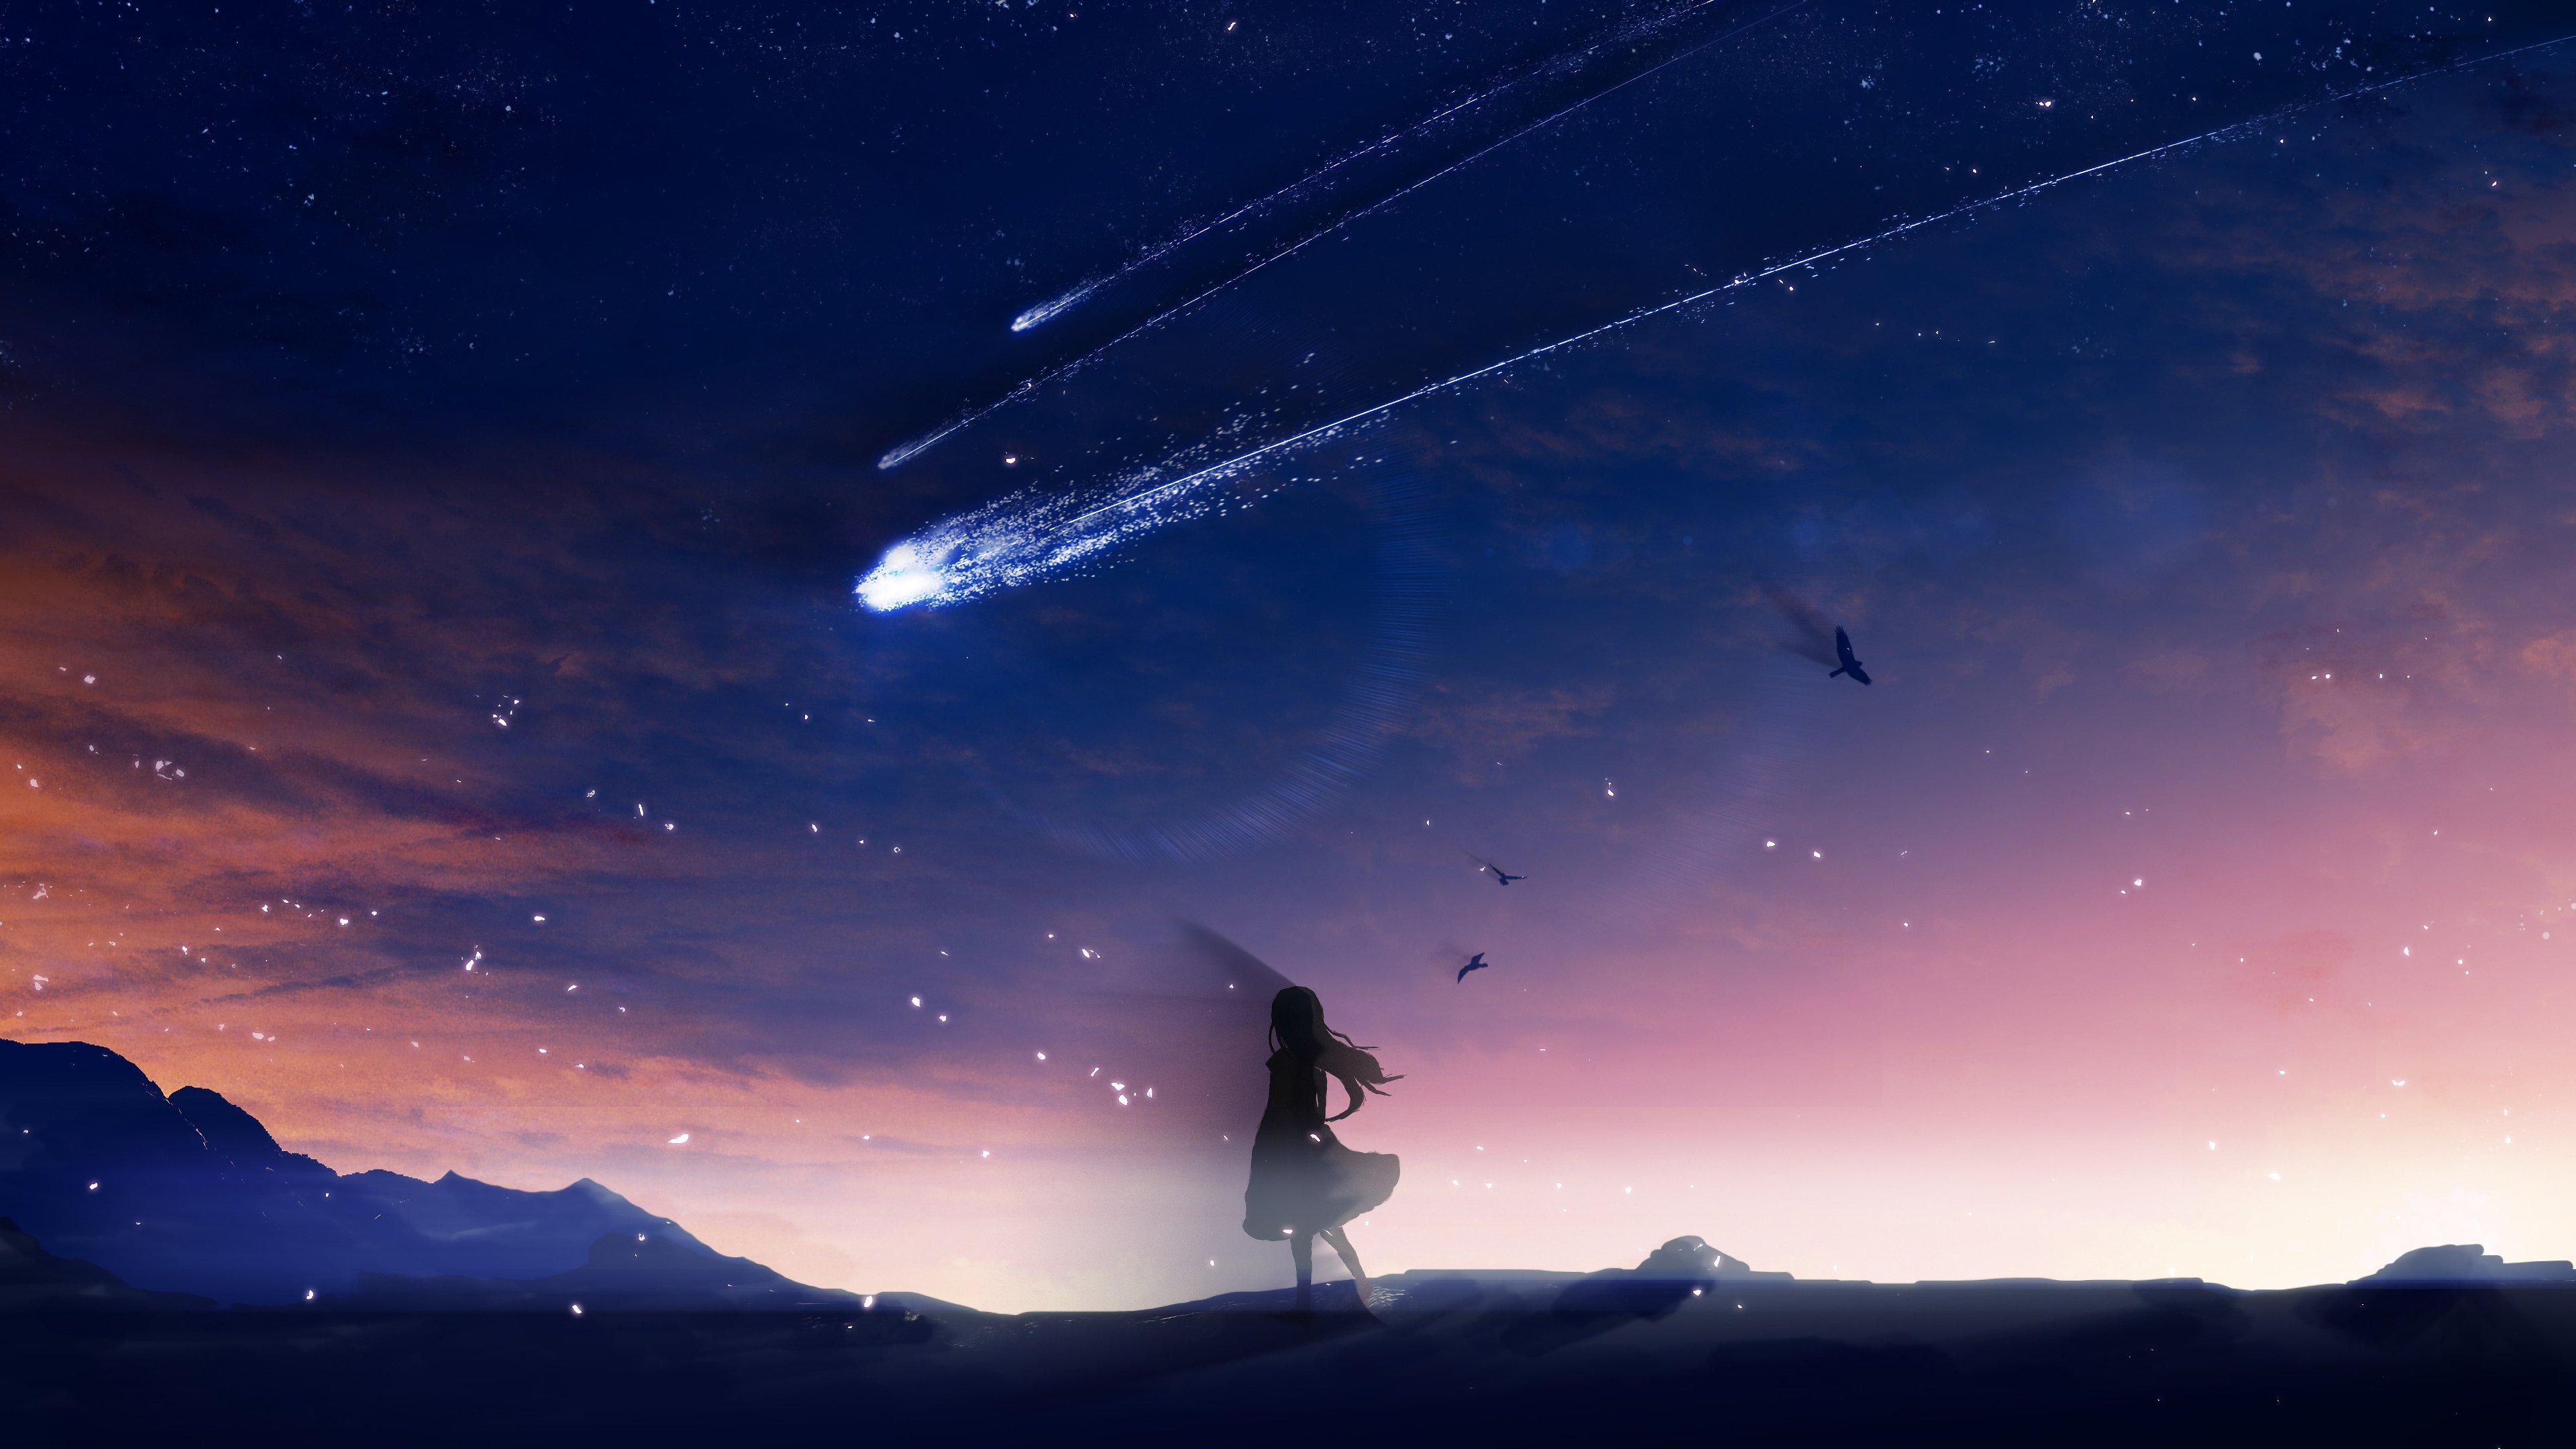 Anime Night Sky Wallpaper 4k Anime Landscape Gallery